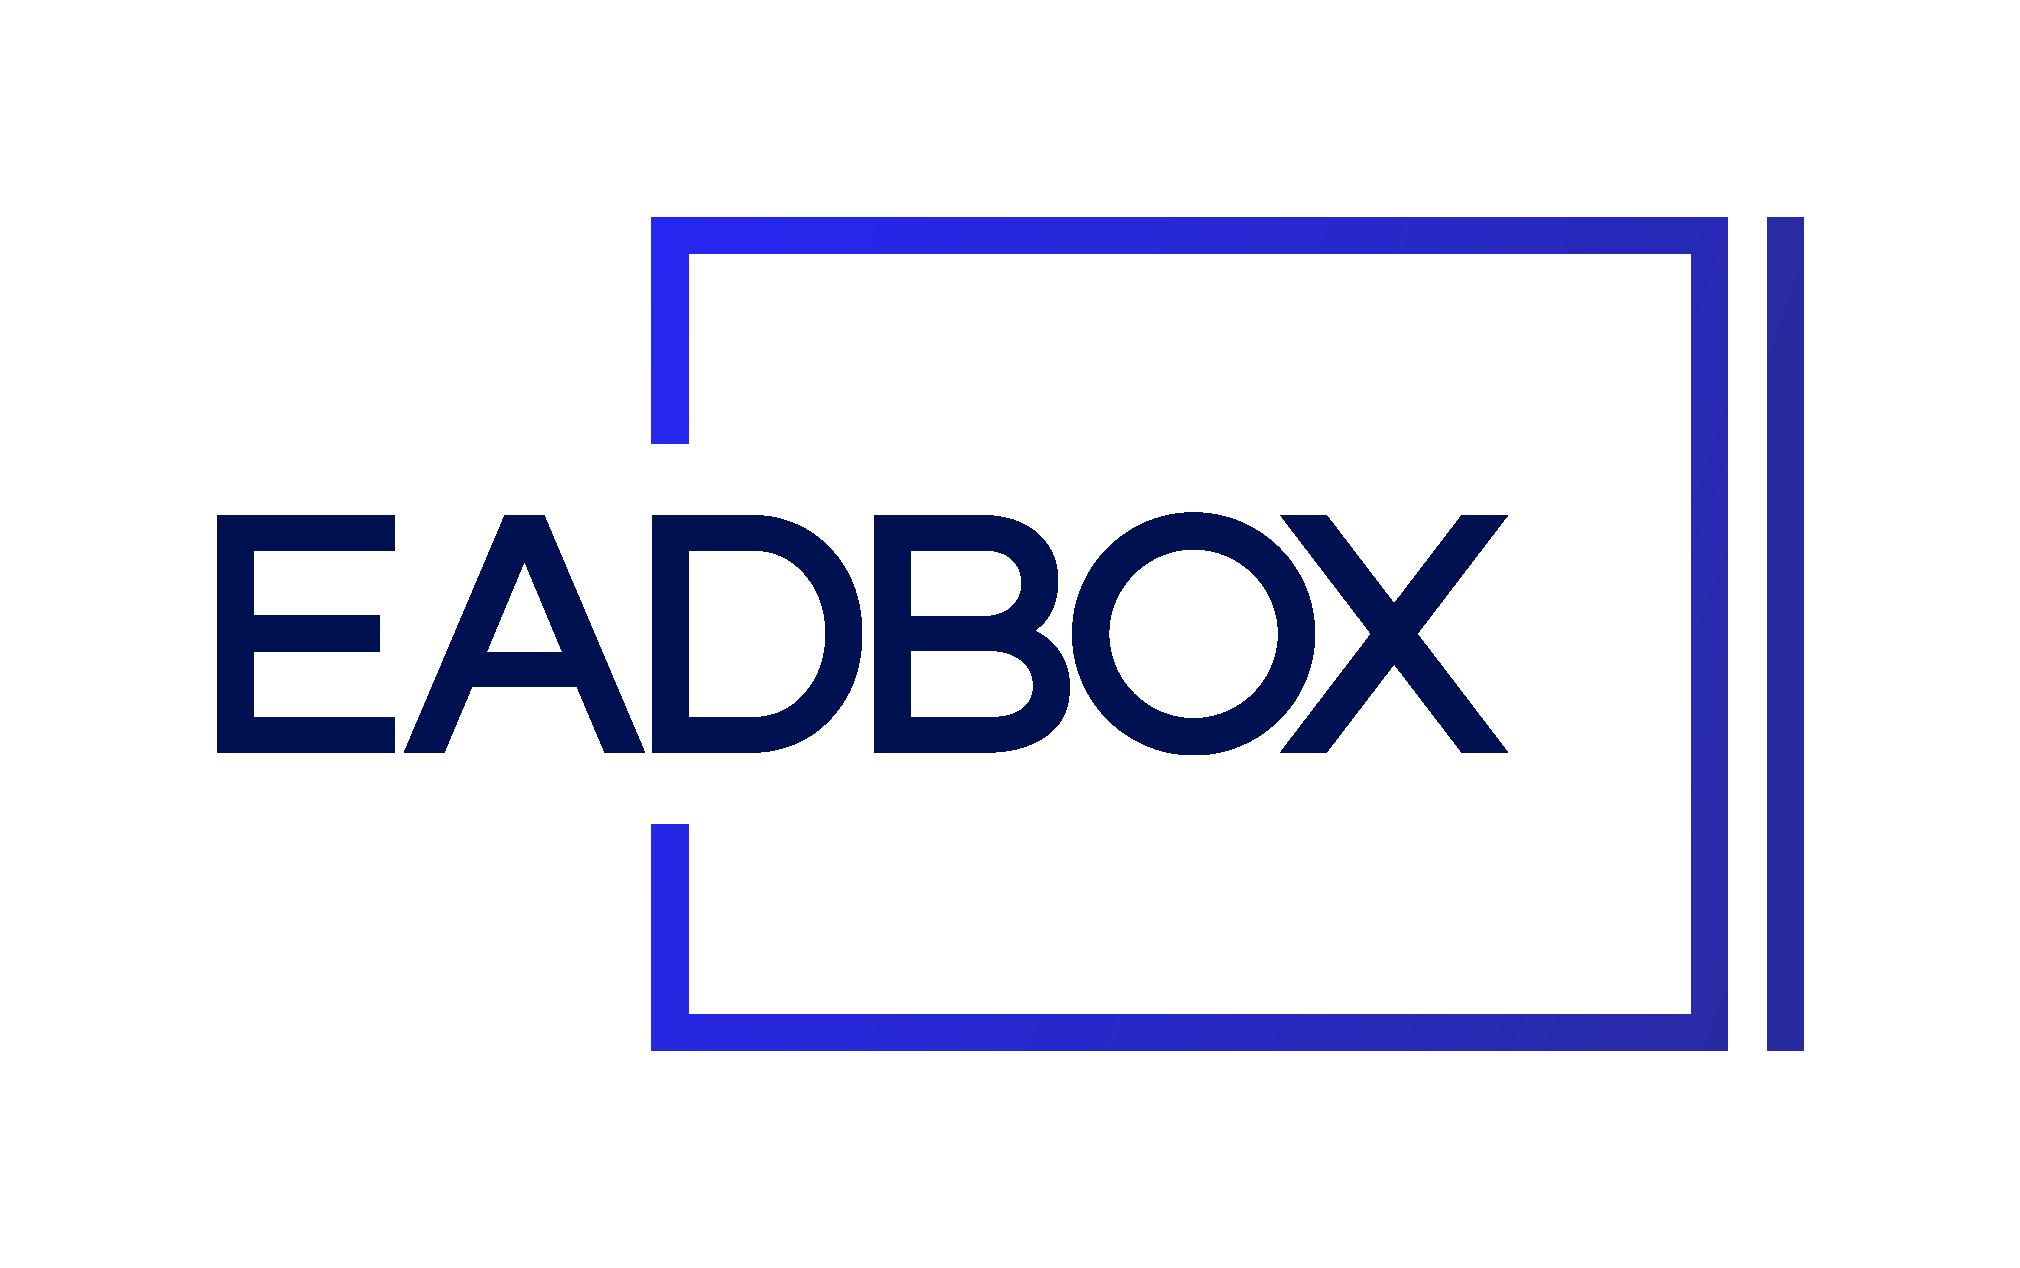 Eadbox Image